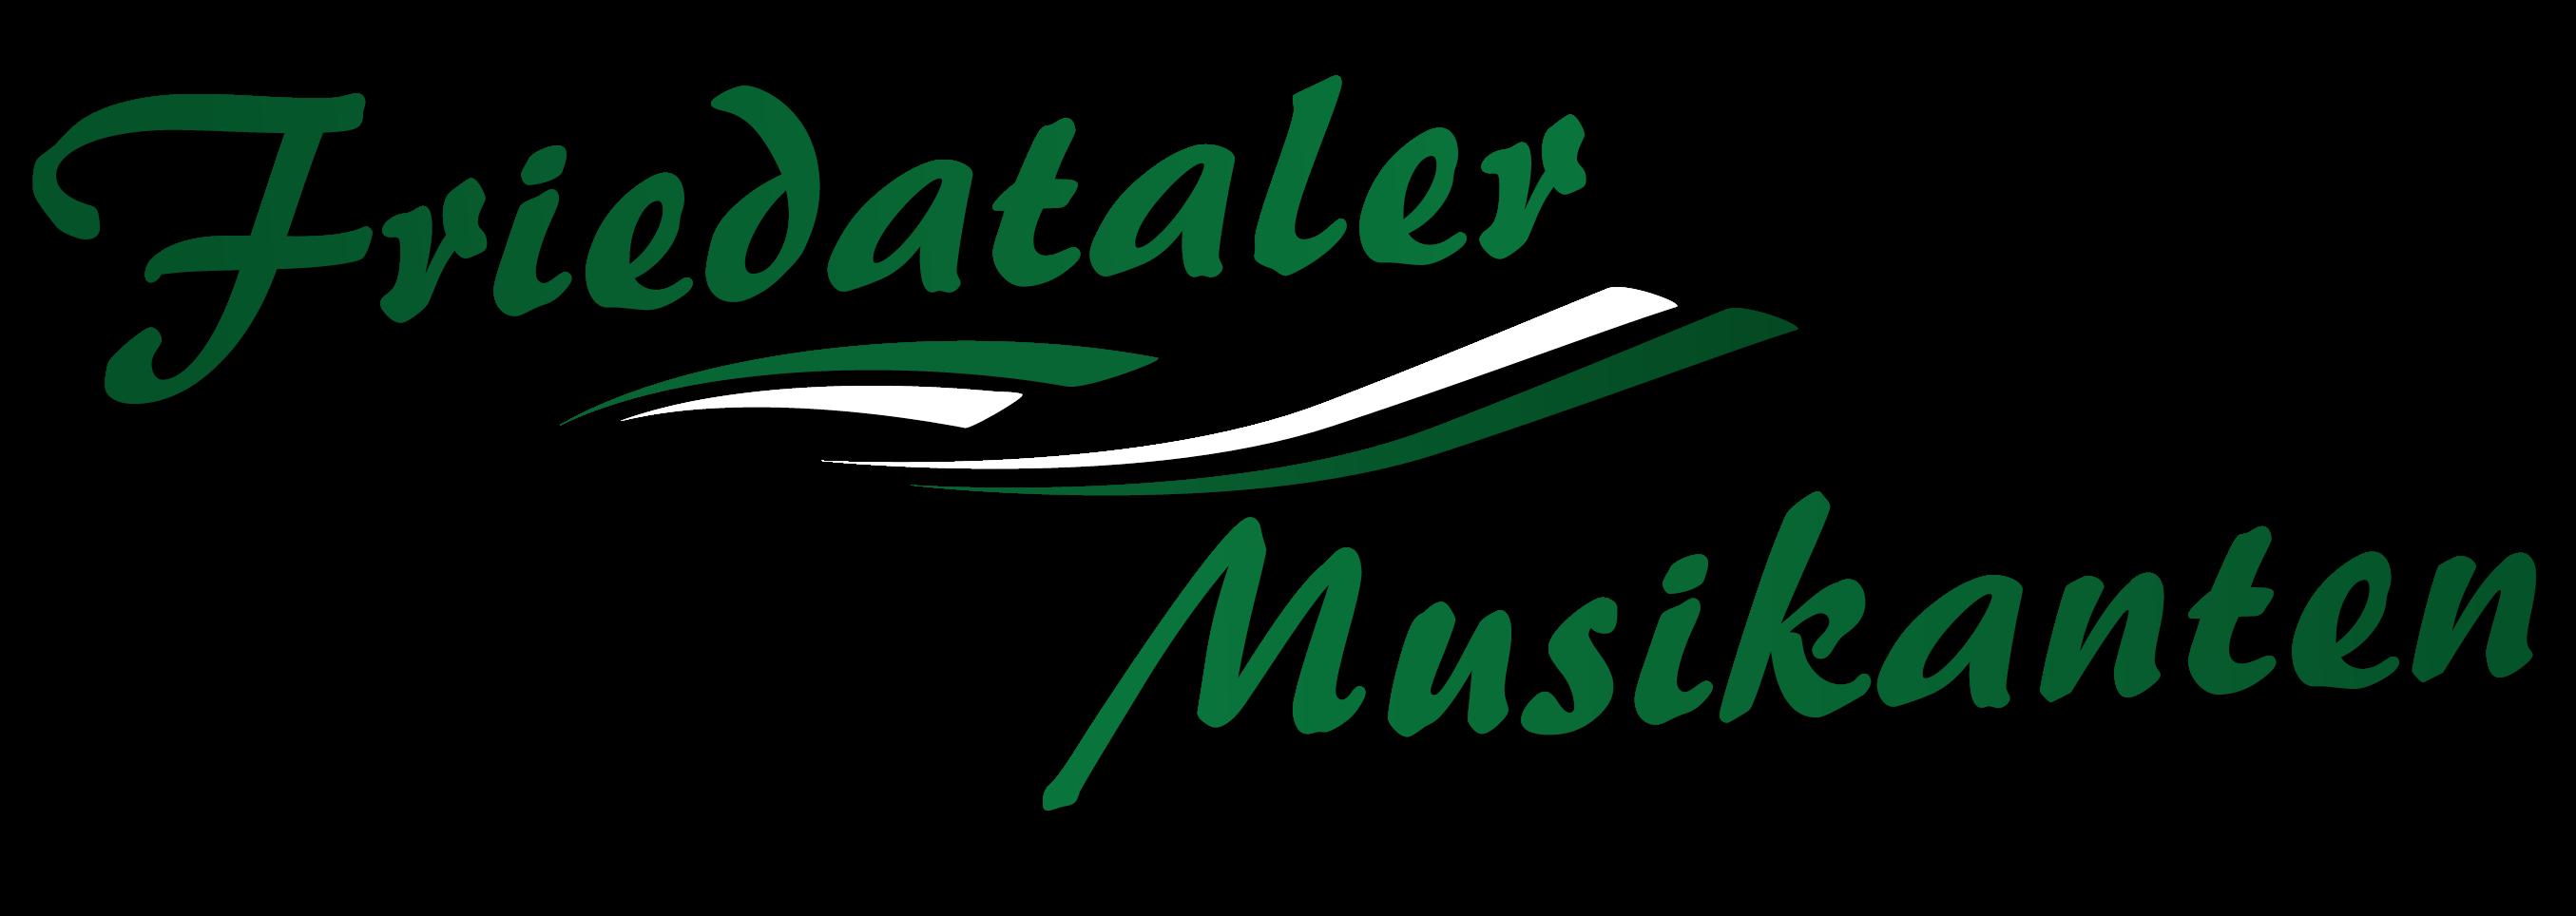 Friedataler Musikanten